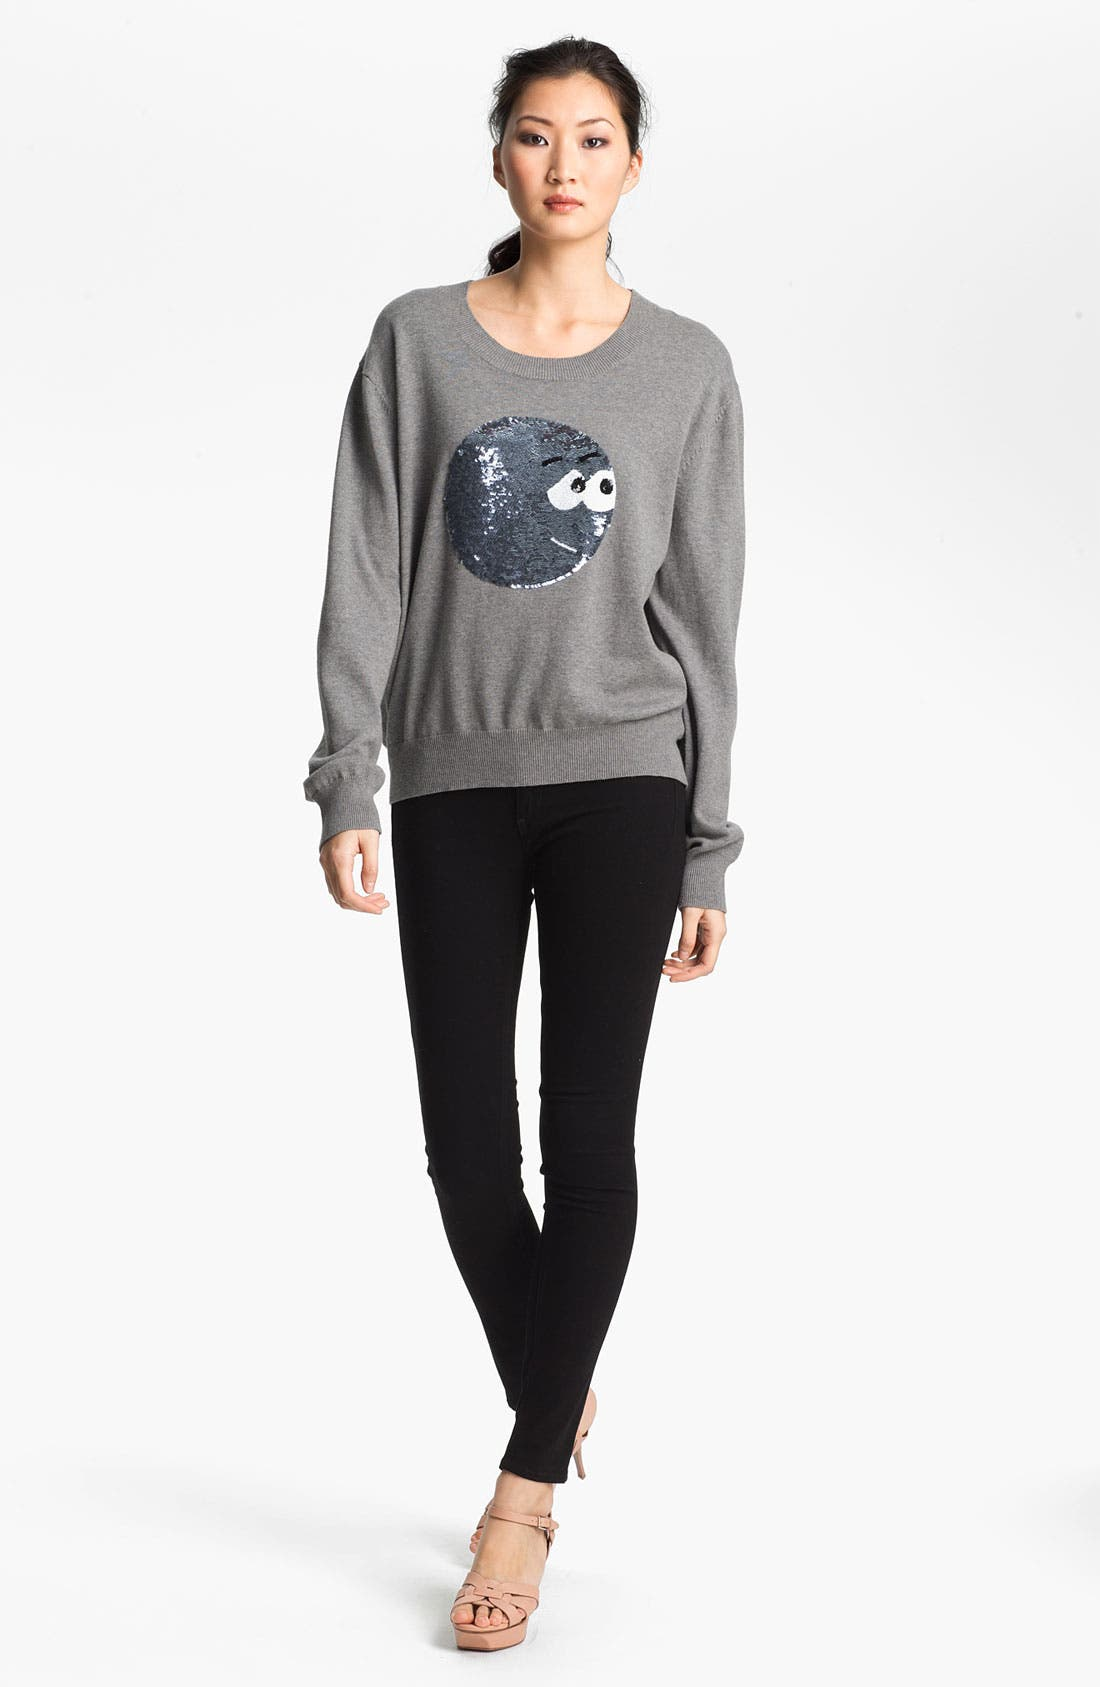 Alternate Image 1 Selected - Markus Lupfer Sequin Cartoon Face Sweater